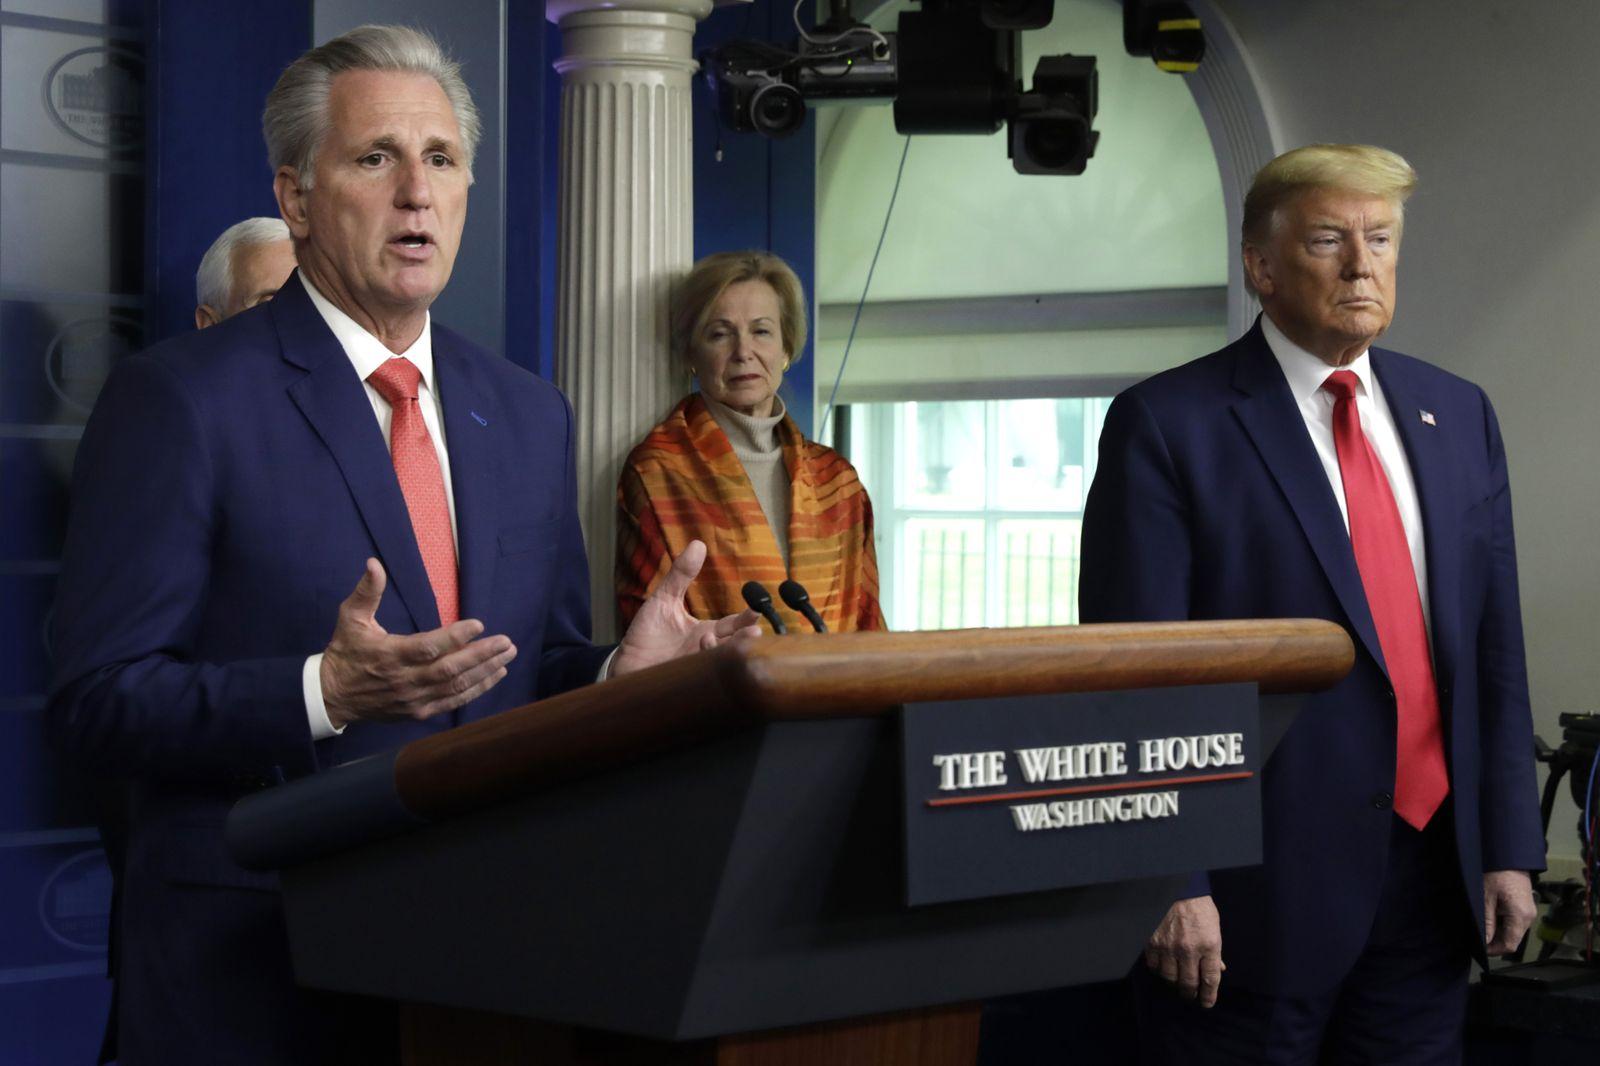 Donald Trump speaks on the Coronavirus - Washington, Usa - 03 Apr 2020